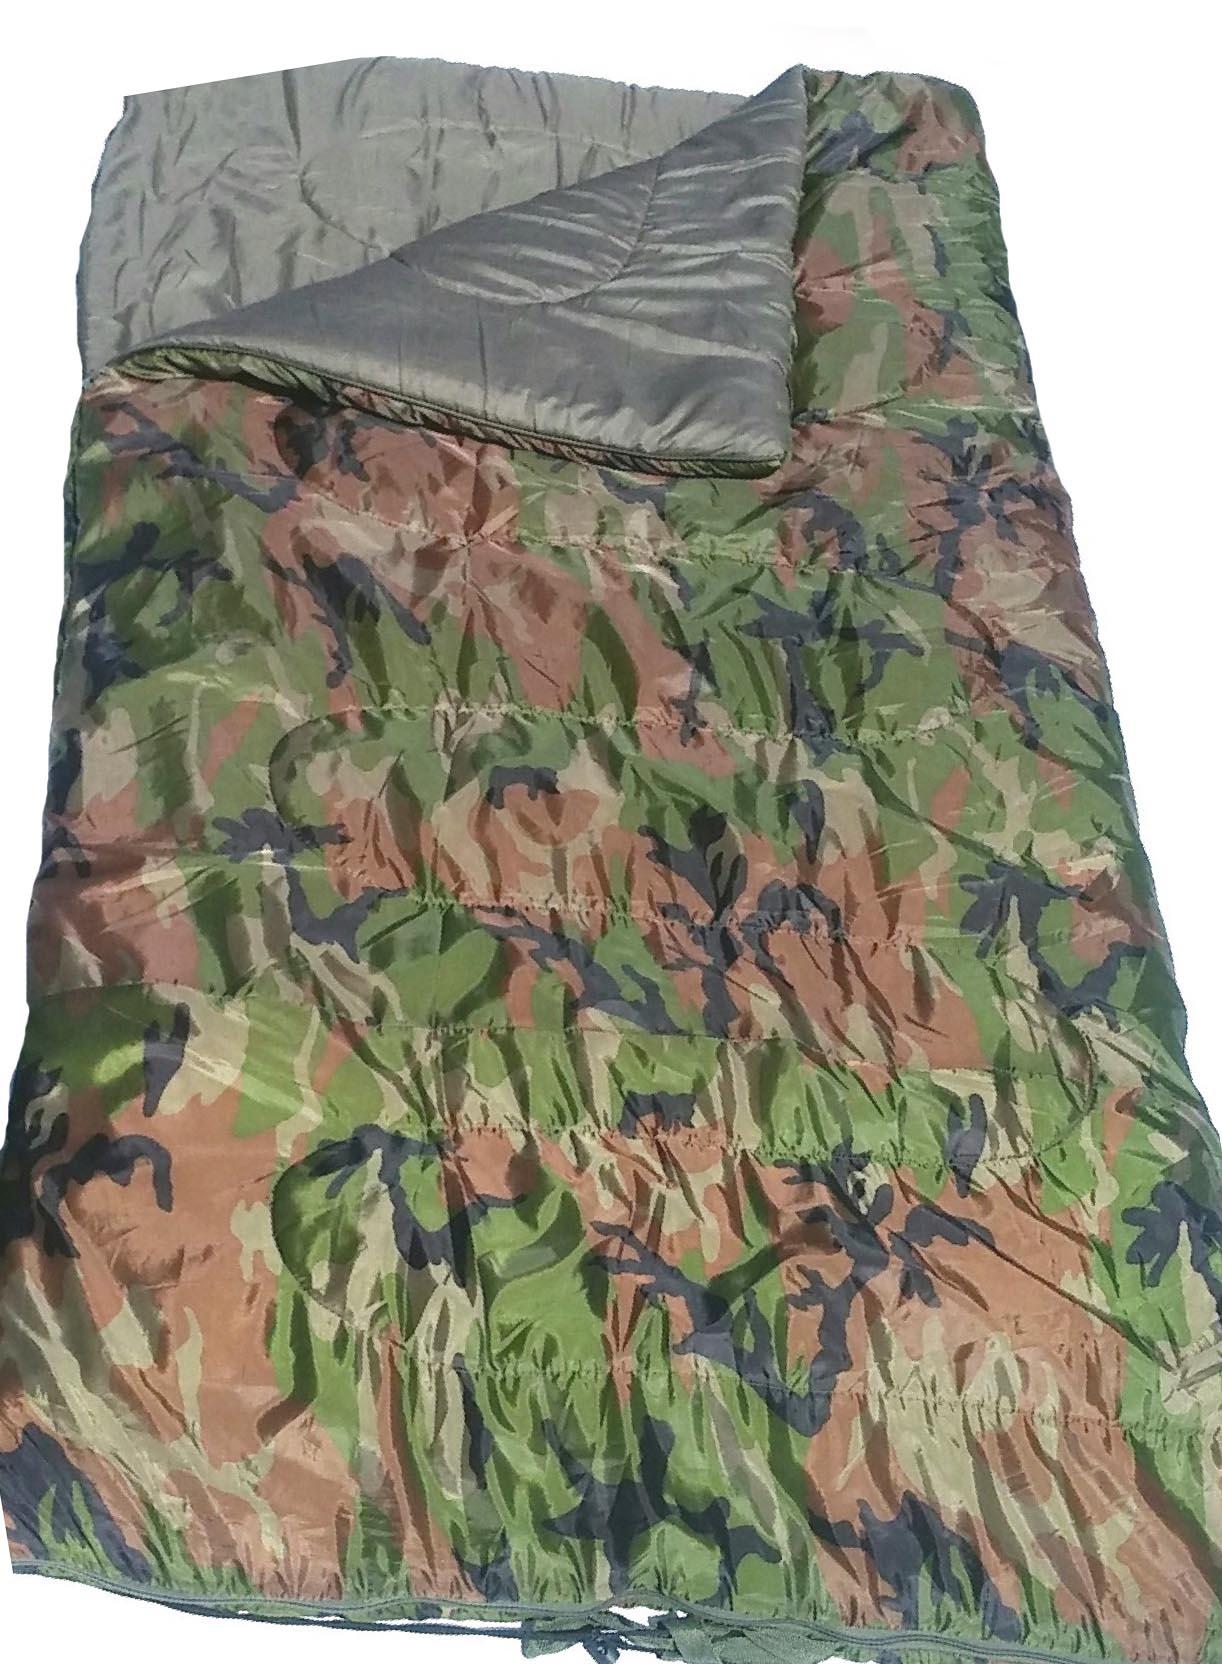 Sac de couchage camouflage